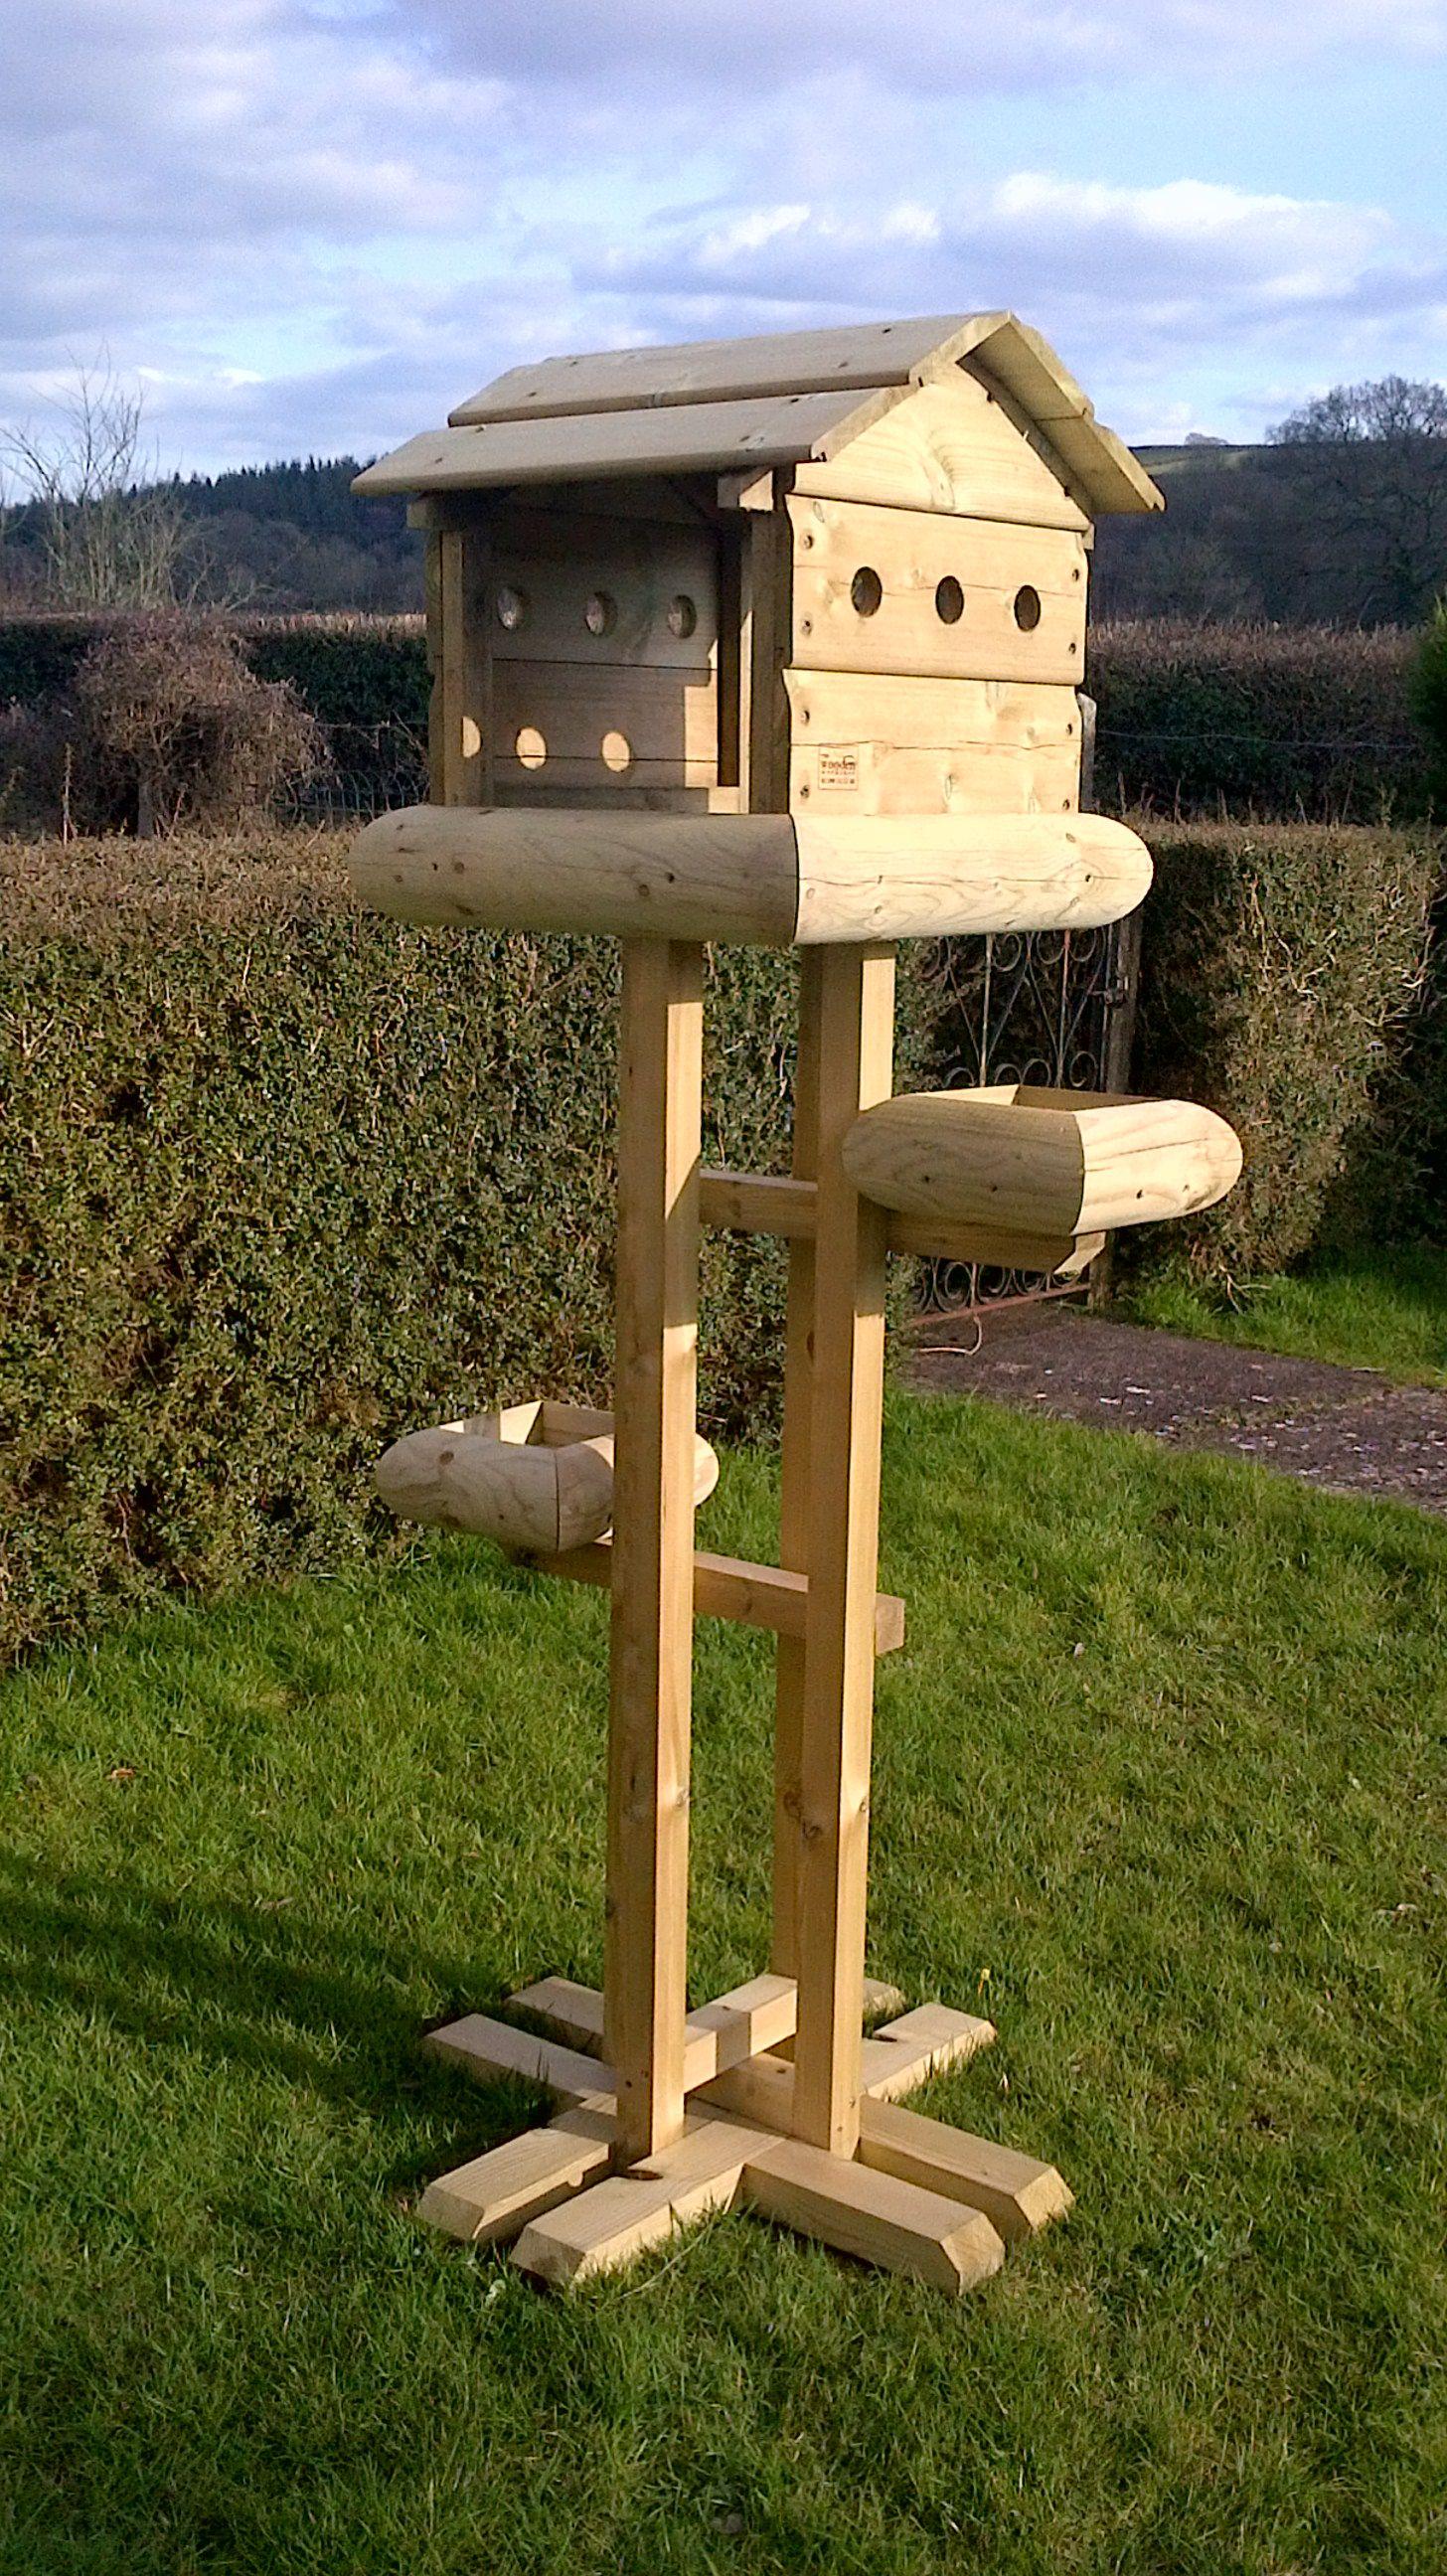 Bird Table Plans Outdoor Plans And Projects Woodarchivist Com Fairy Houses Bird House Plans Bird House Feeder